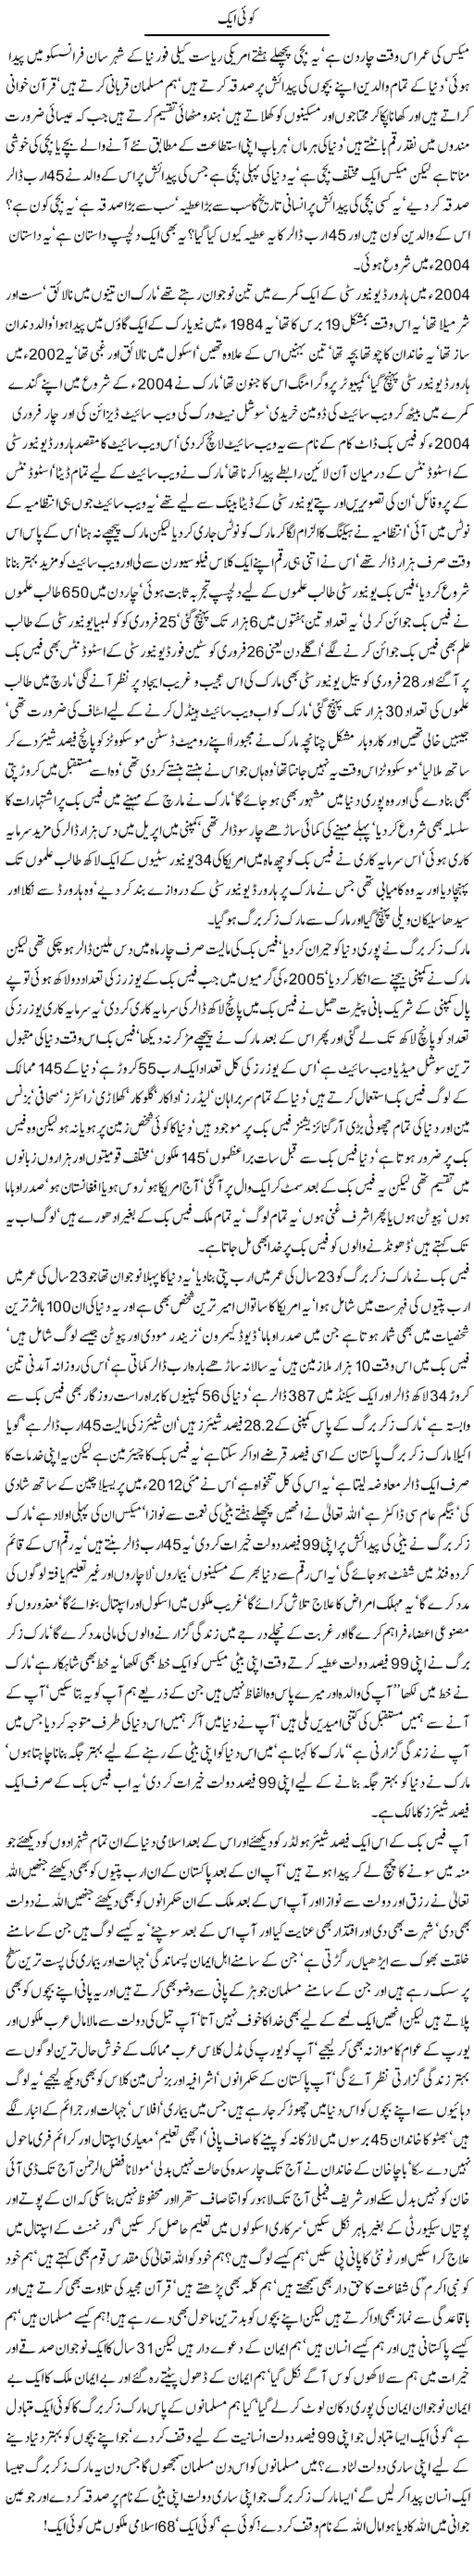 advance medical system karachi picture 6